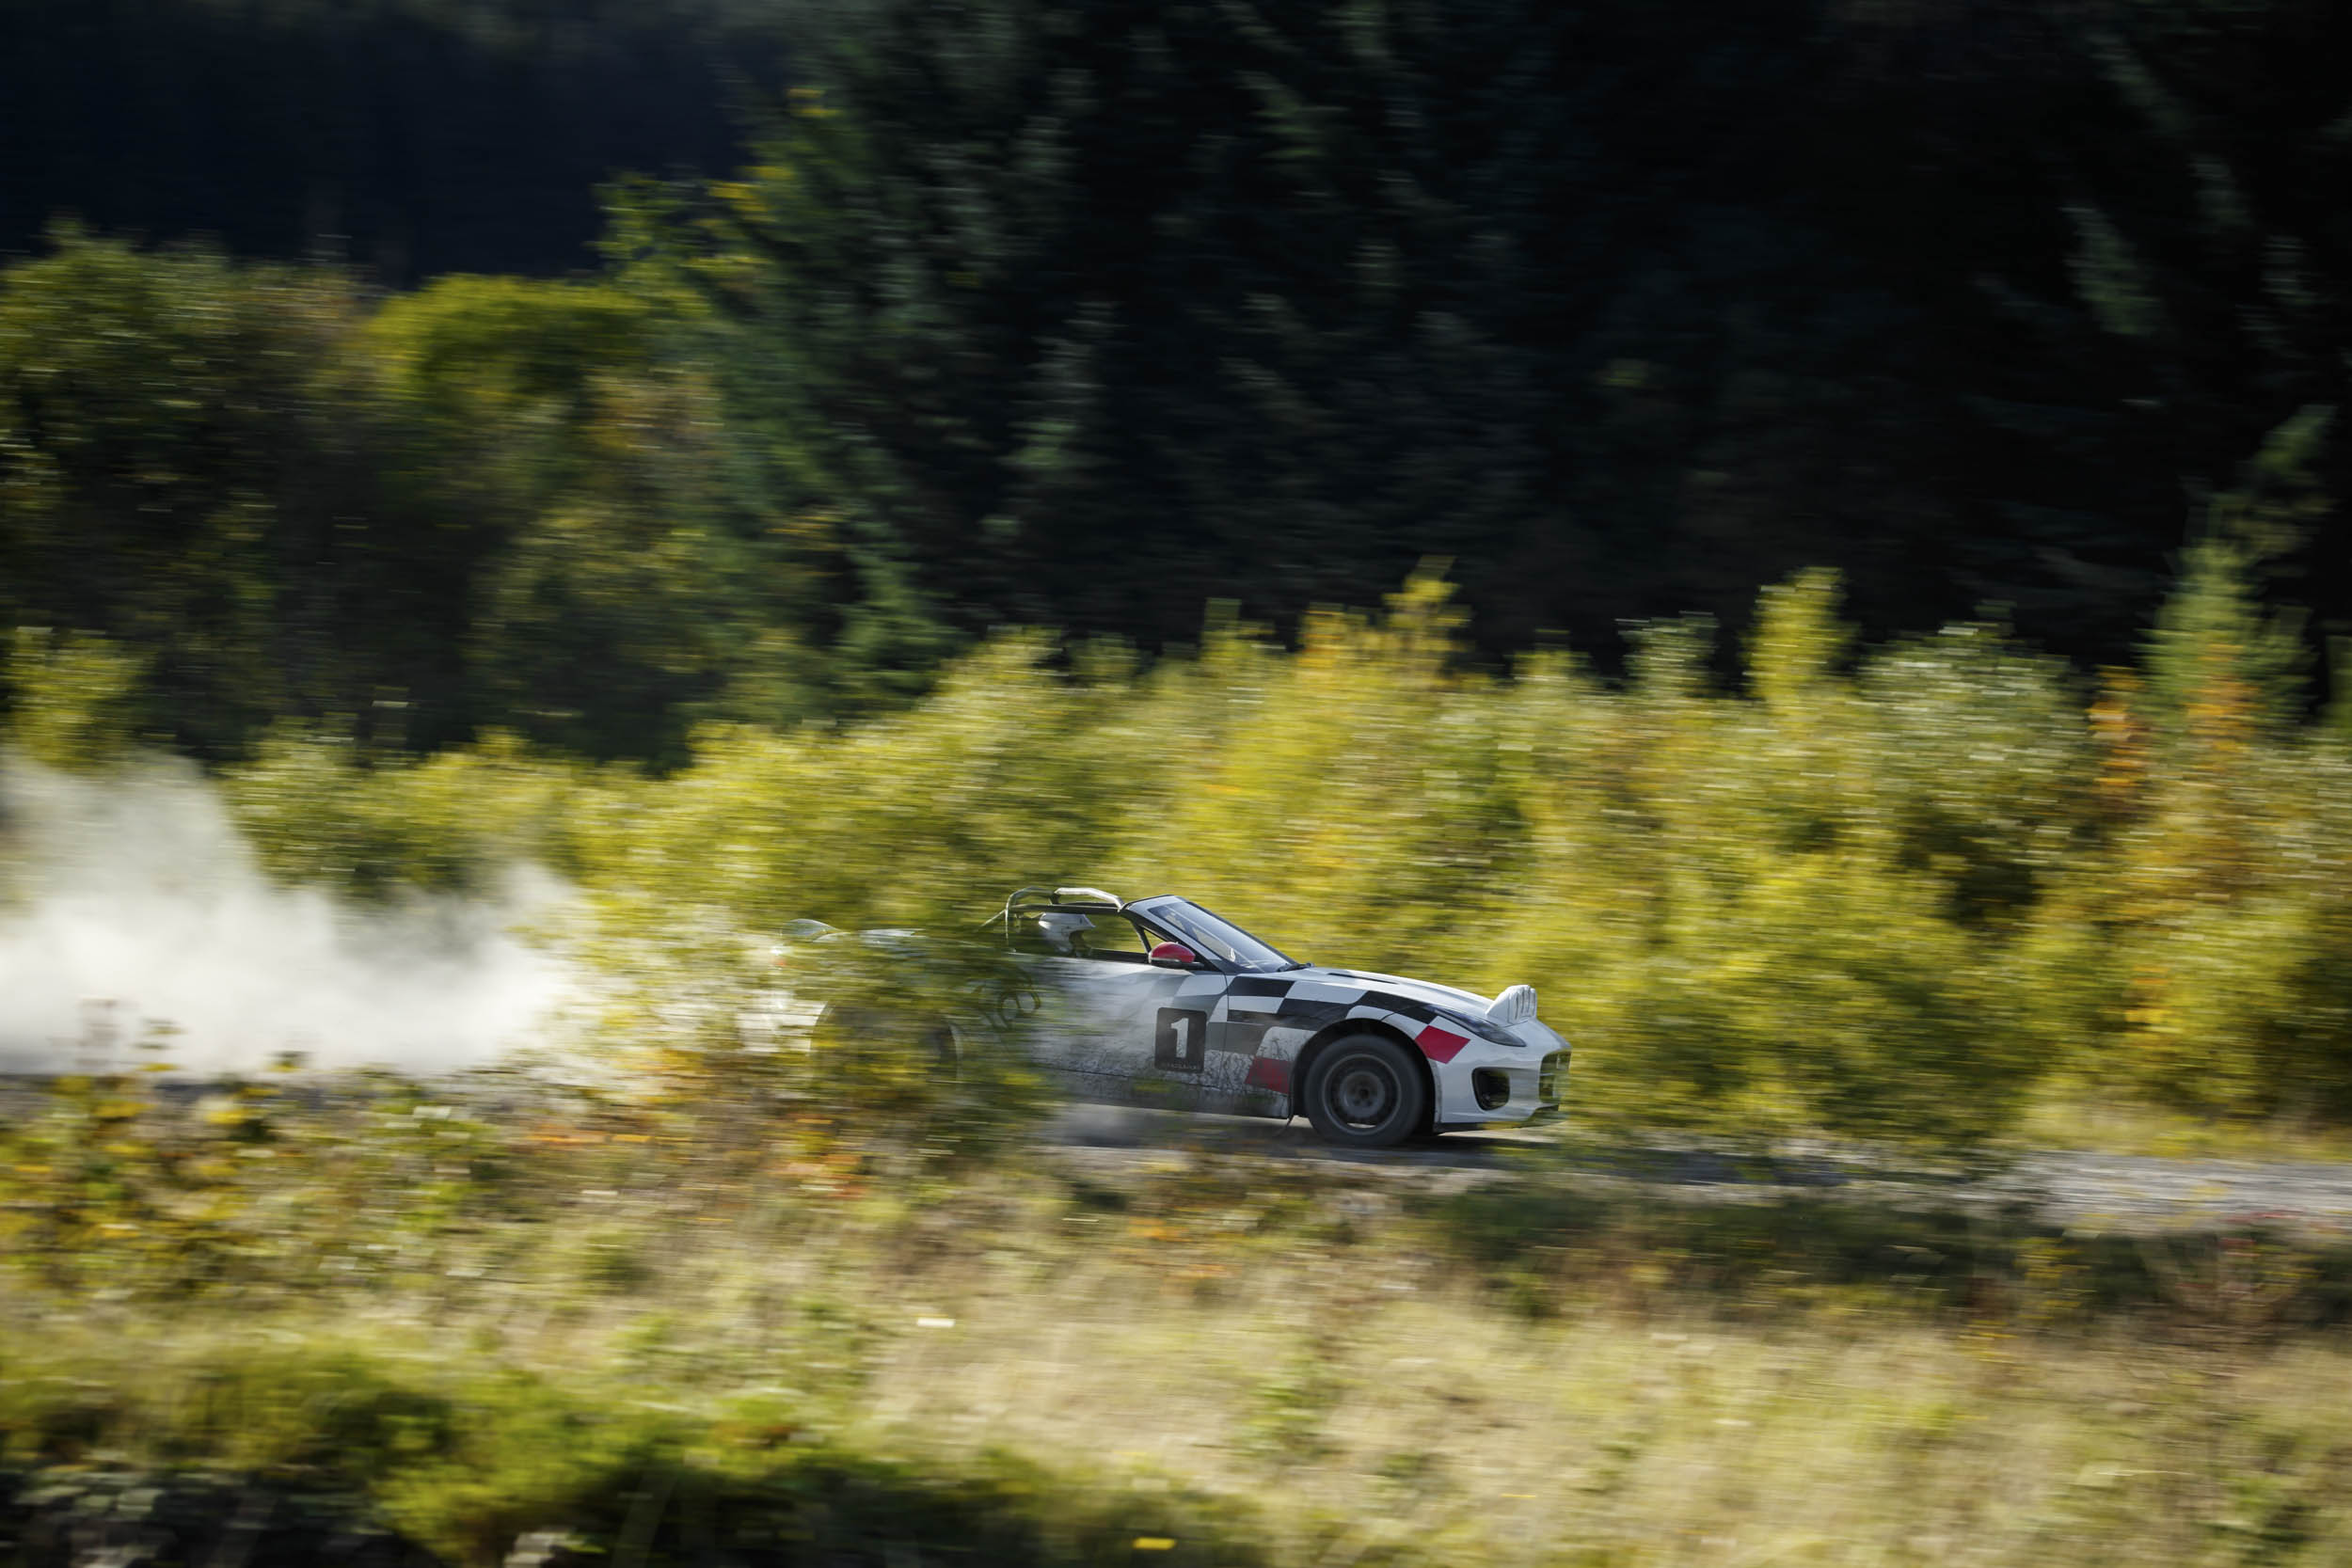 Jaguar F-type convertible rally car through the trees